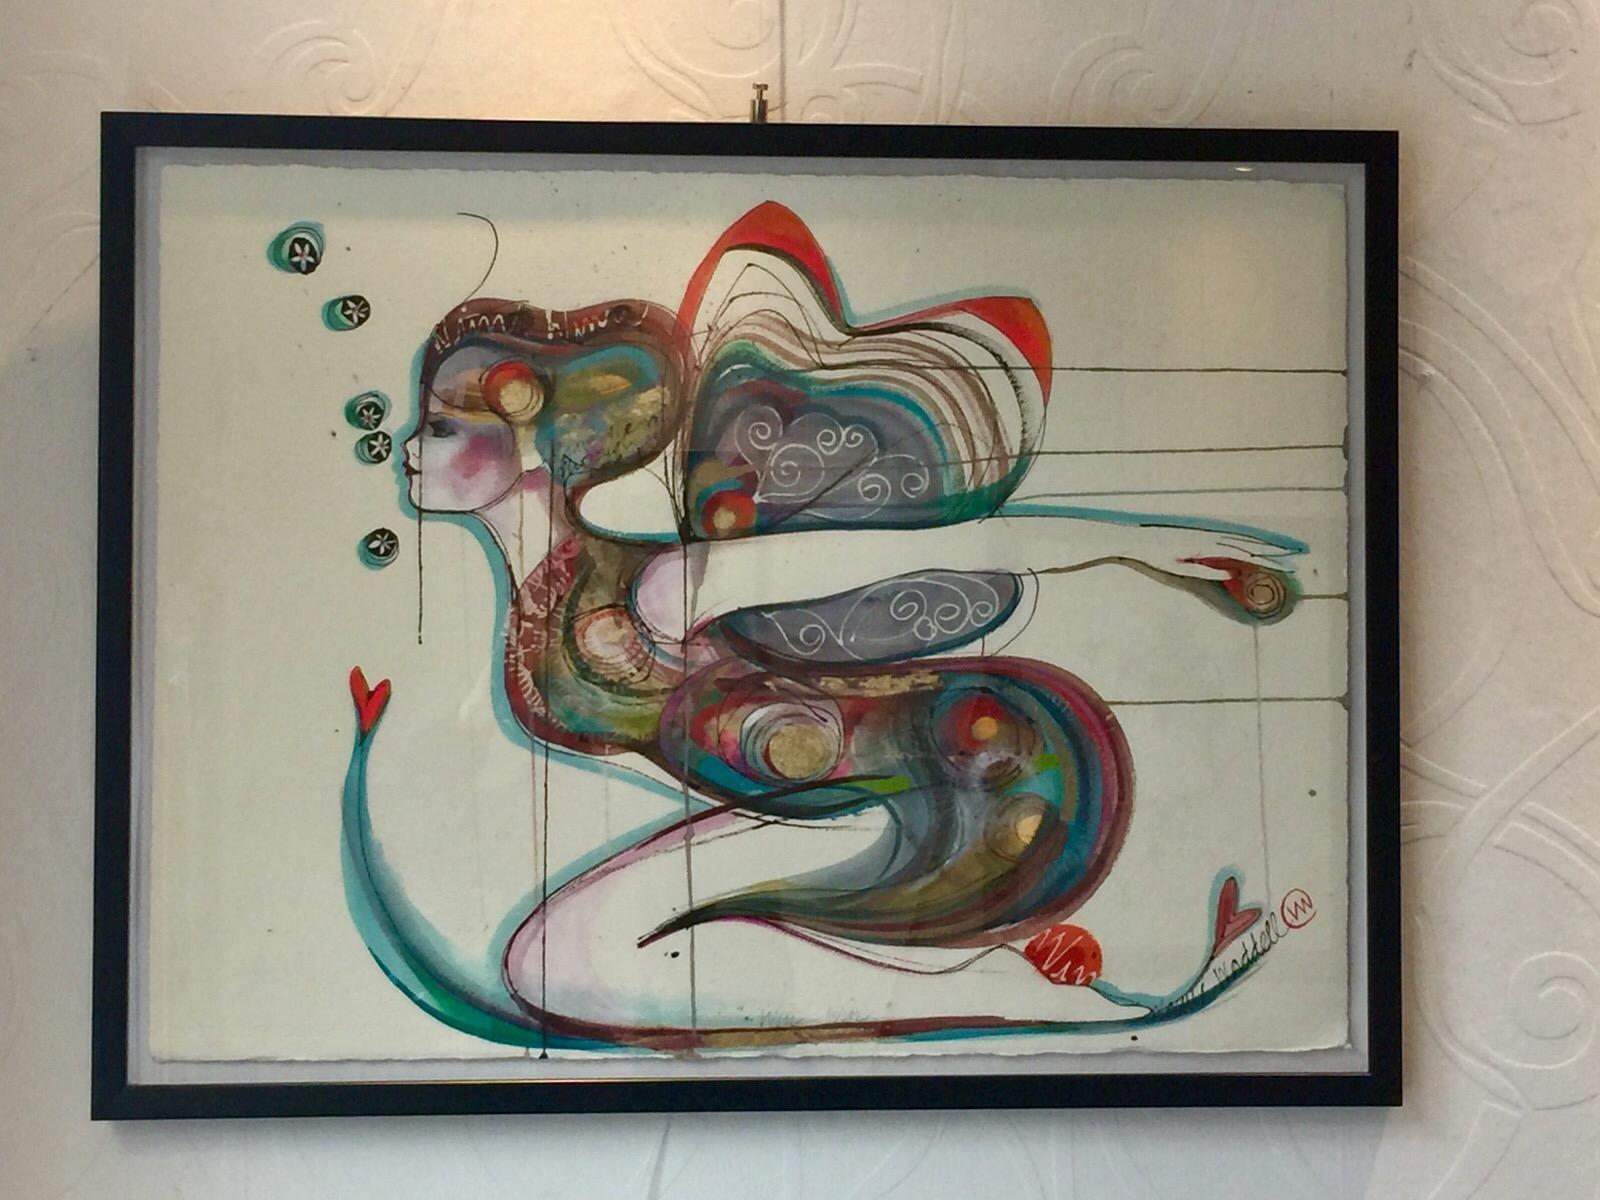 Verena Waddell visual artist INK Win WinVerena Waddell visual artist INK Win Win